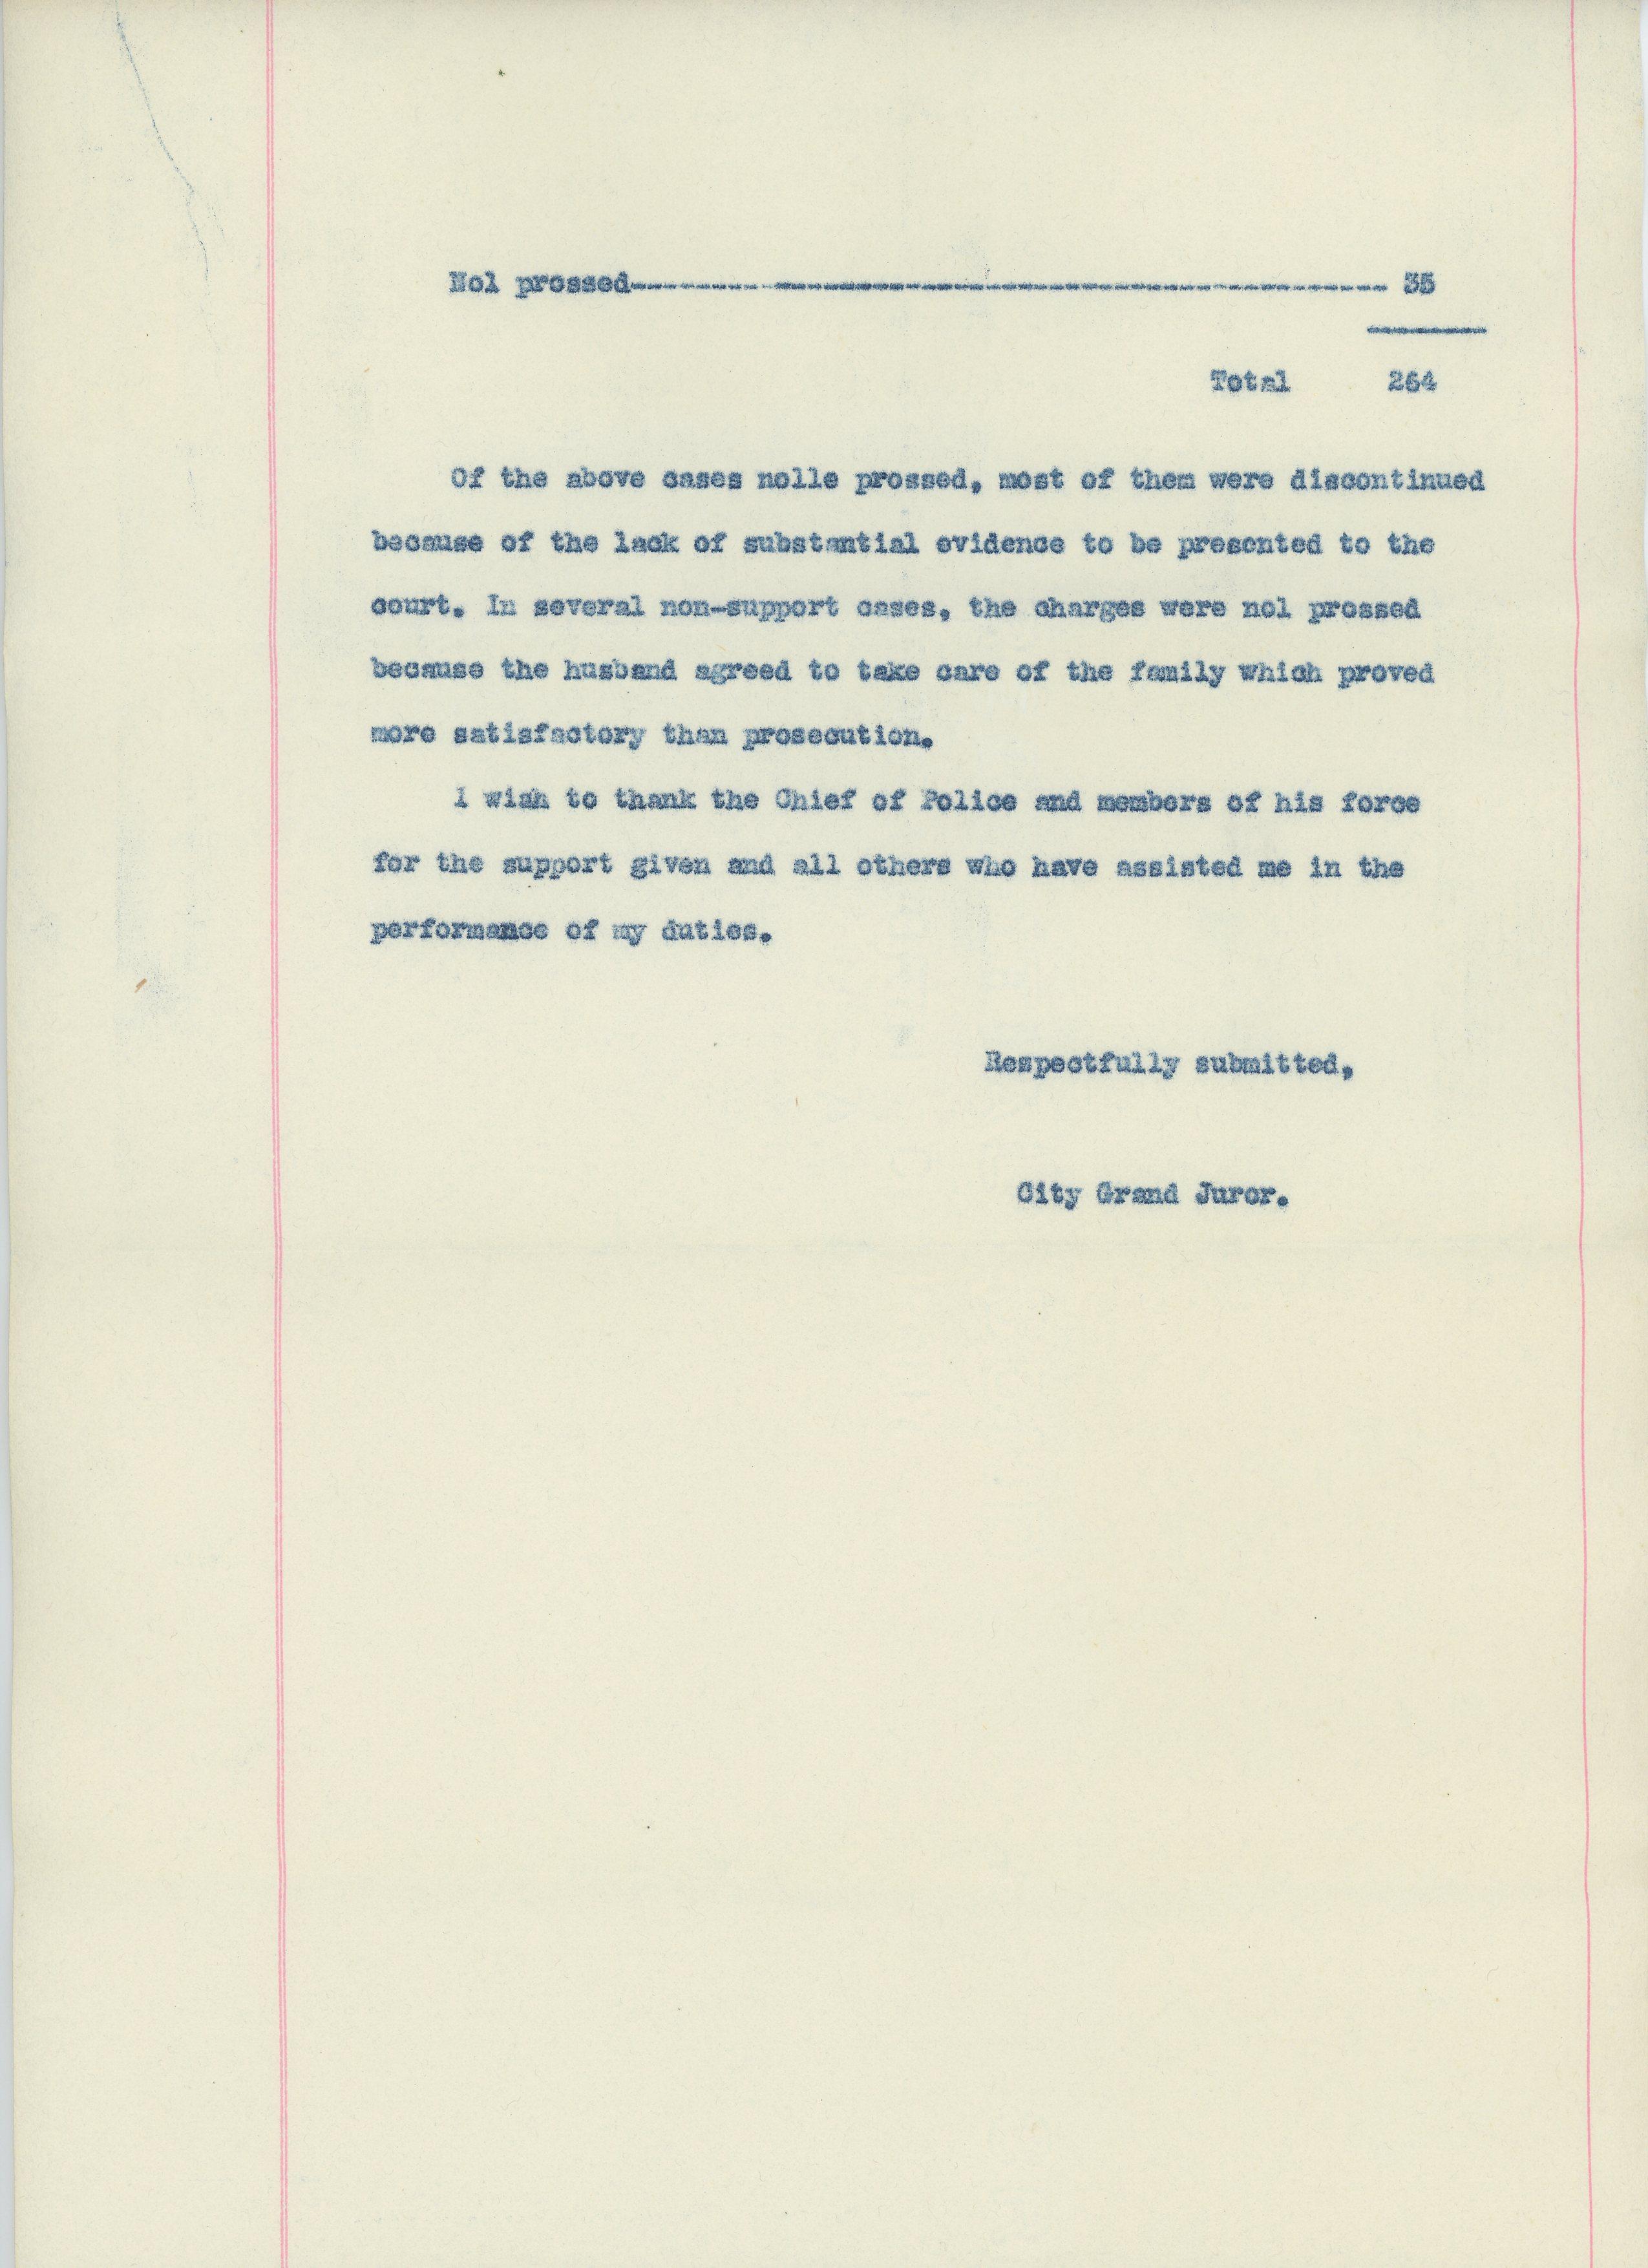 Report of the City Grand Juror, 1926